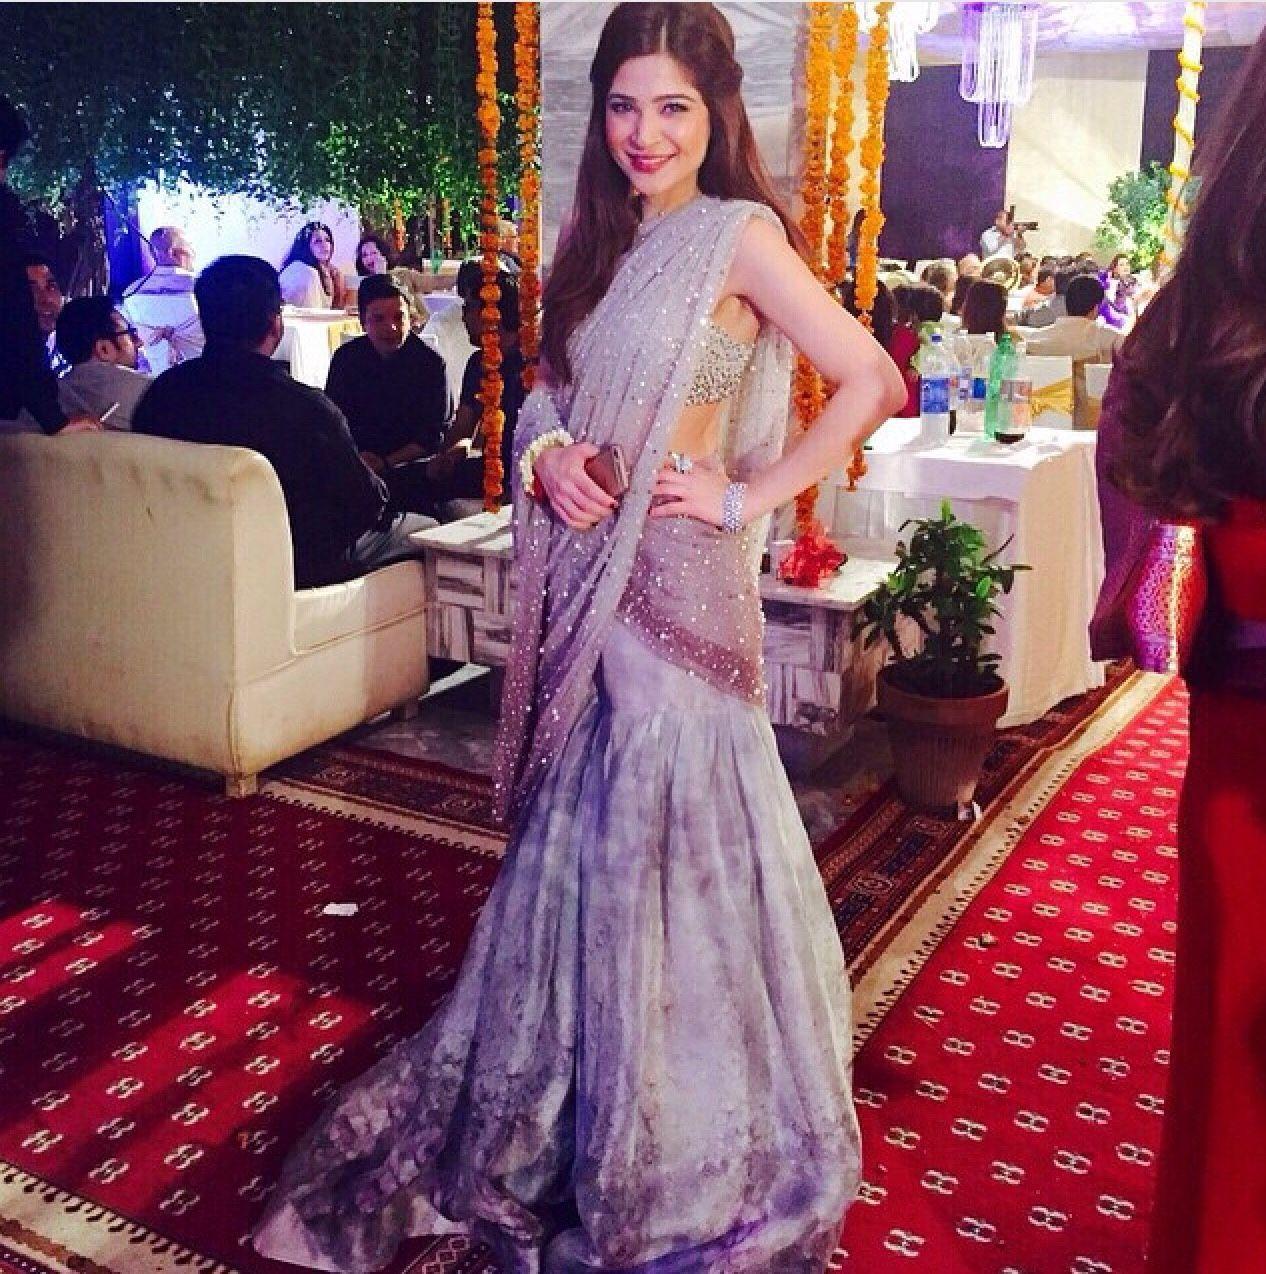 Hairstyle Girl Jora: Highfashionpakistan: Pakistani Actress Ayesha Omar Wearing